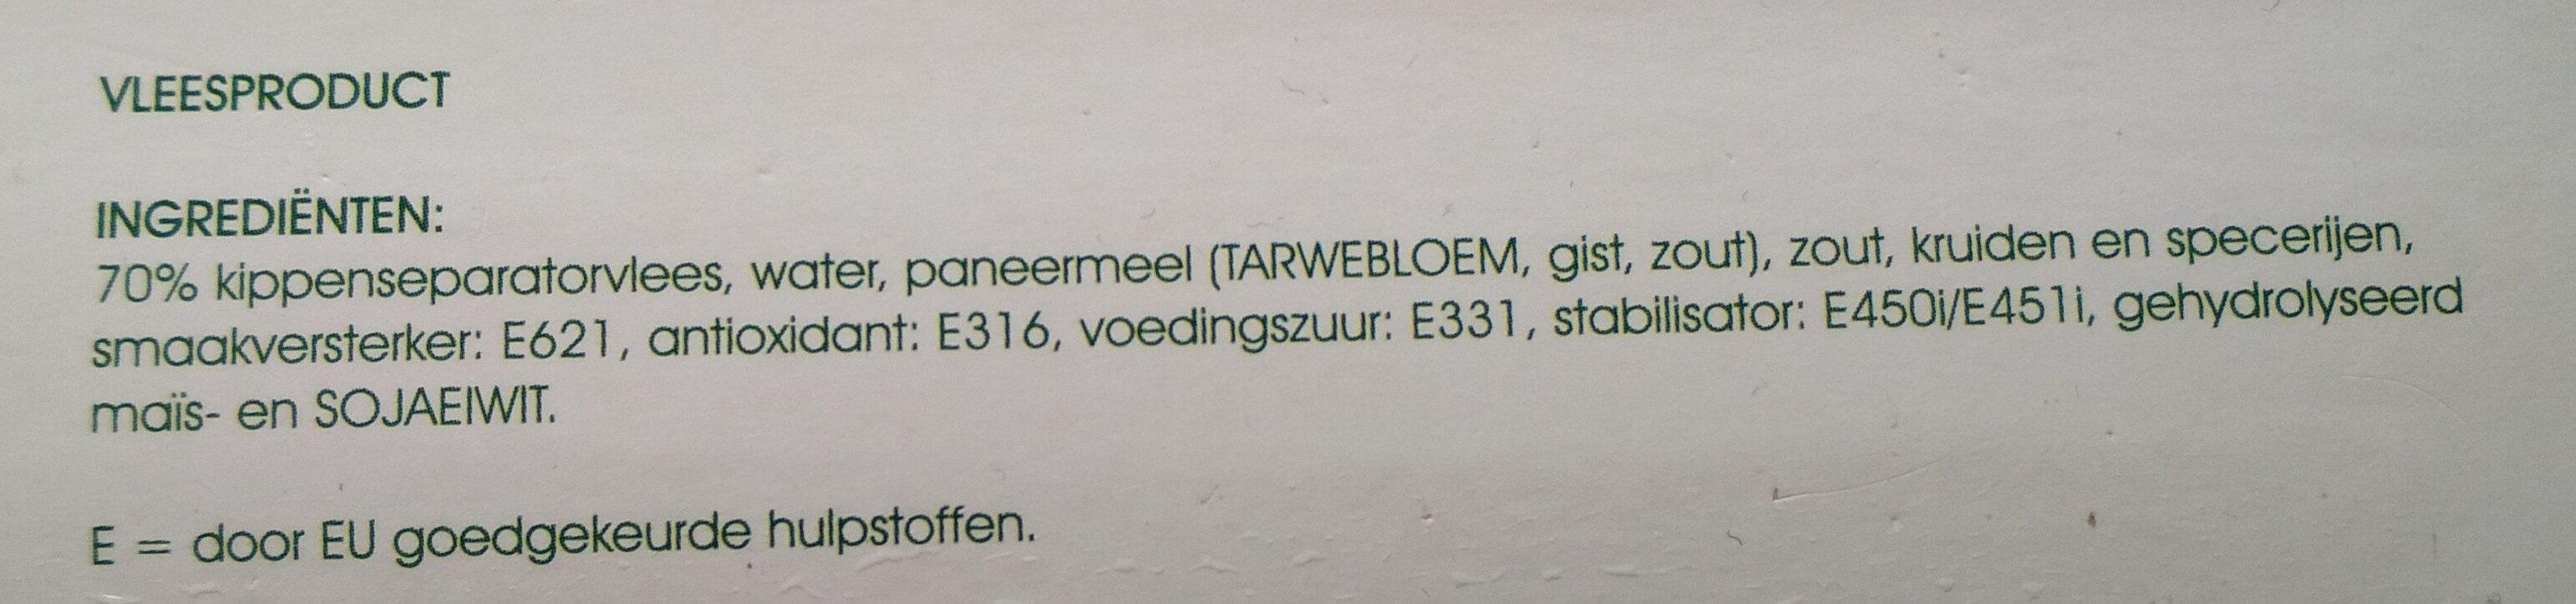 Frikandellen - Ingrediënten - nl